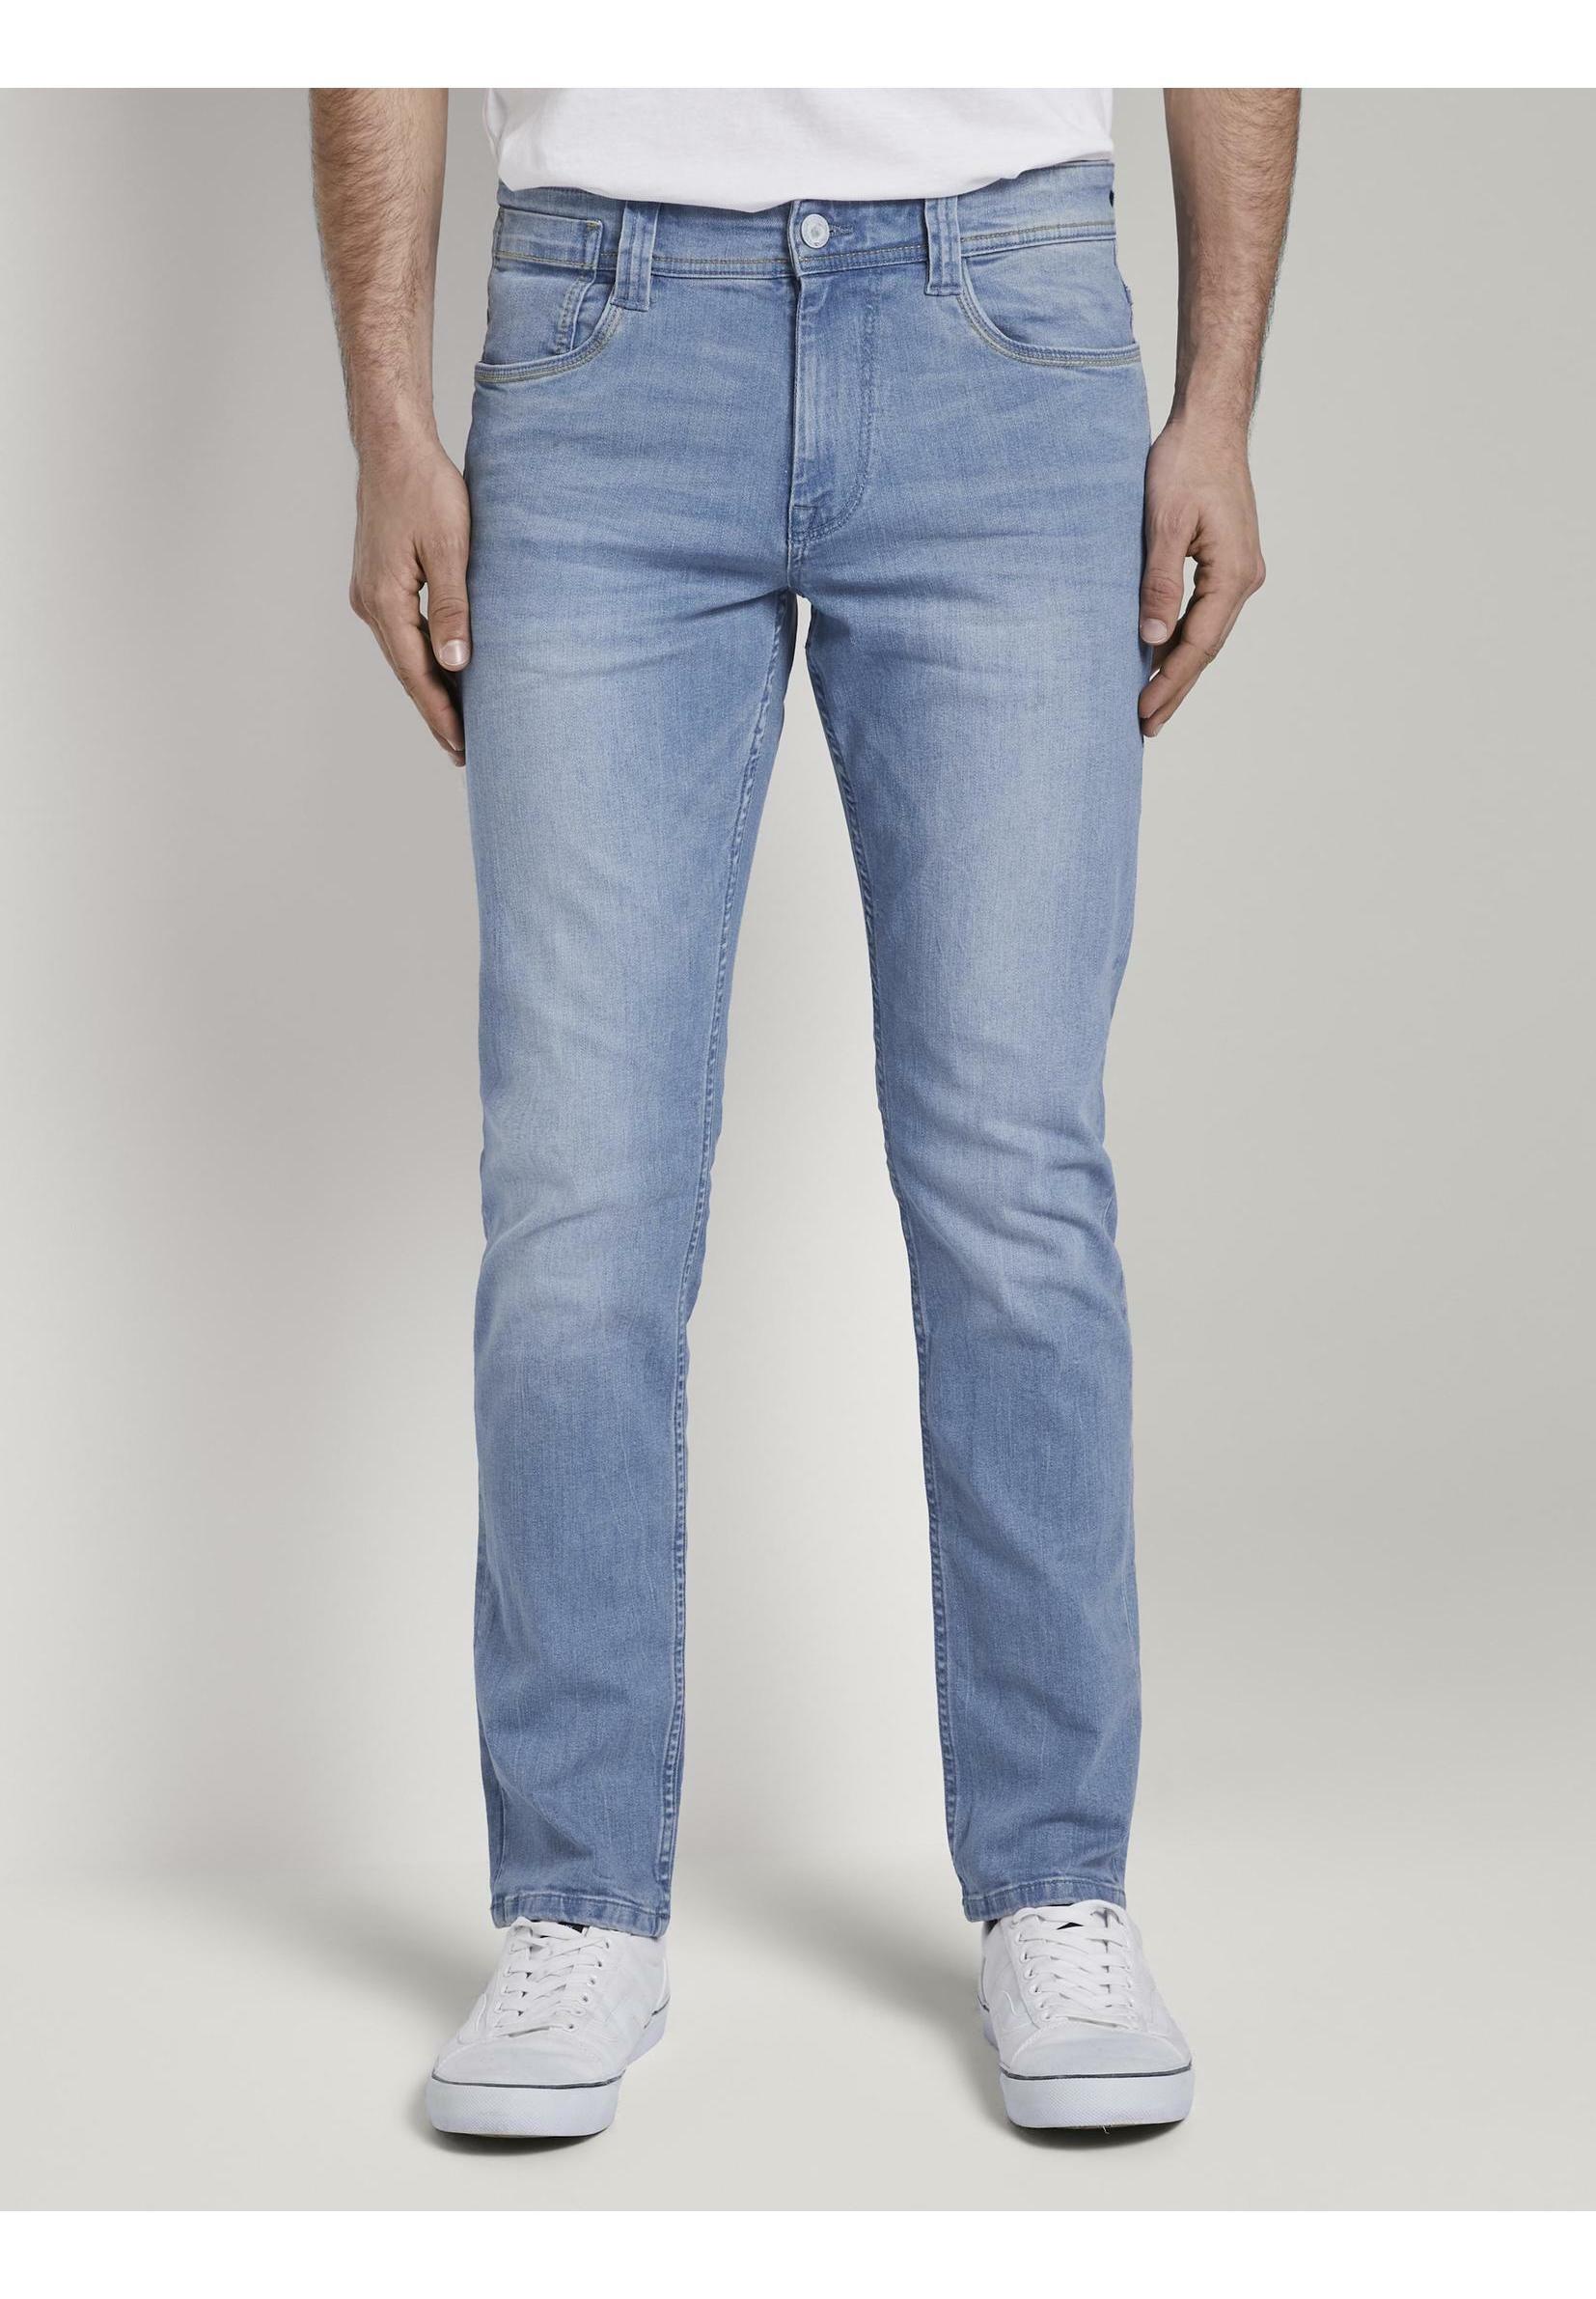 TOM TAILOR JEANSHOSEN JOSH REGULAR SLIM JEANS MIT VERSETZTER MÜN Slim fit jeans bright blue denim